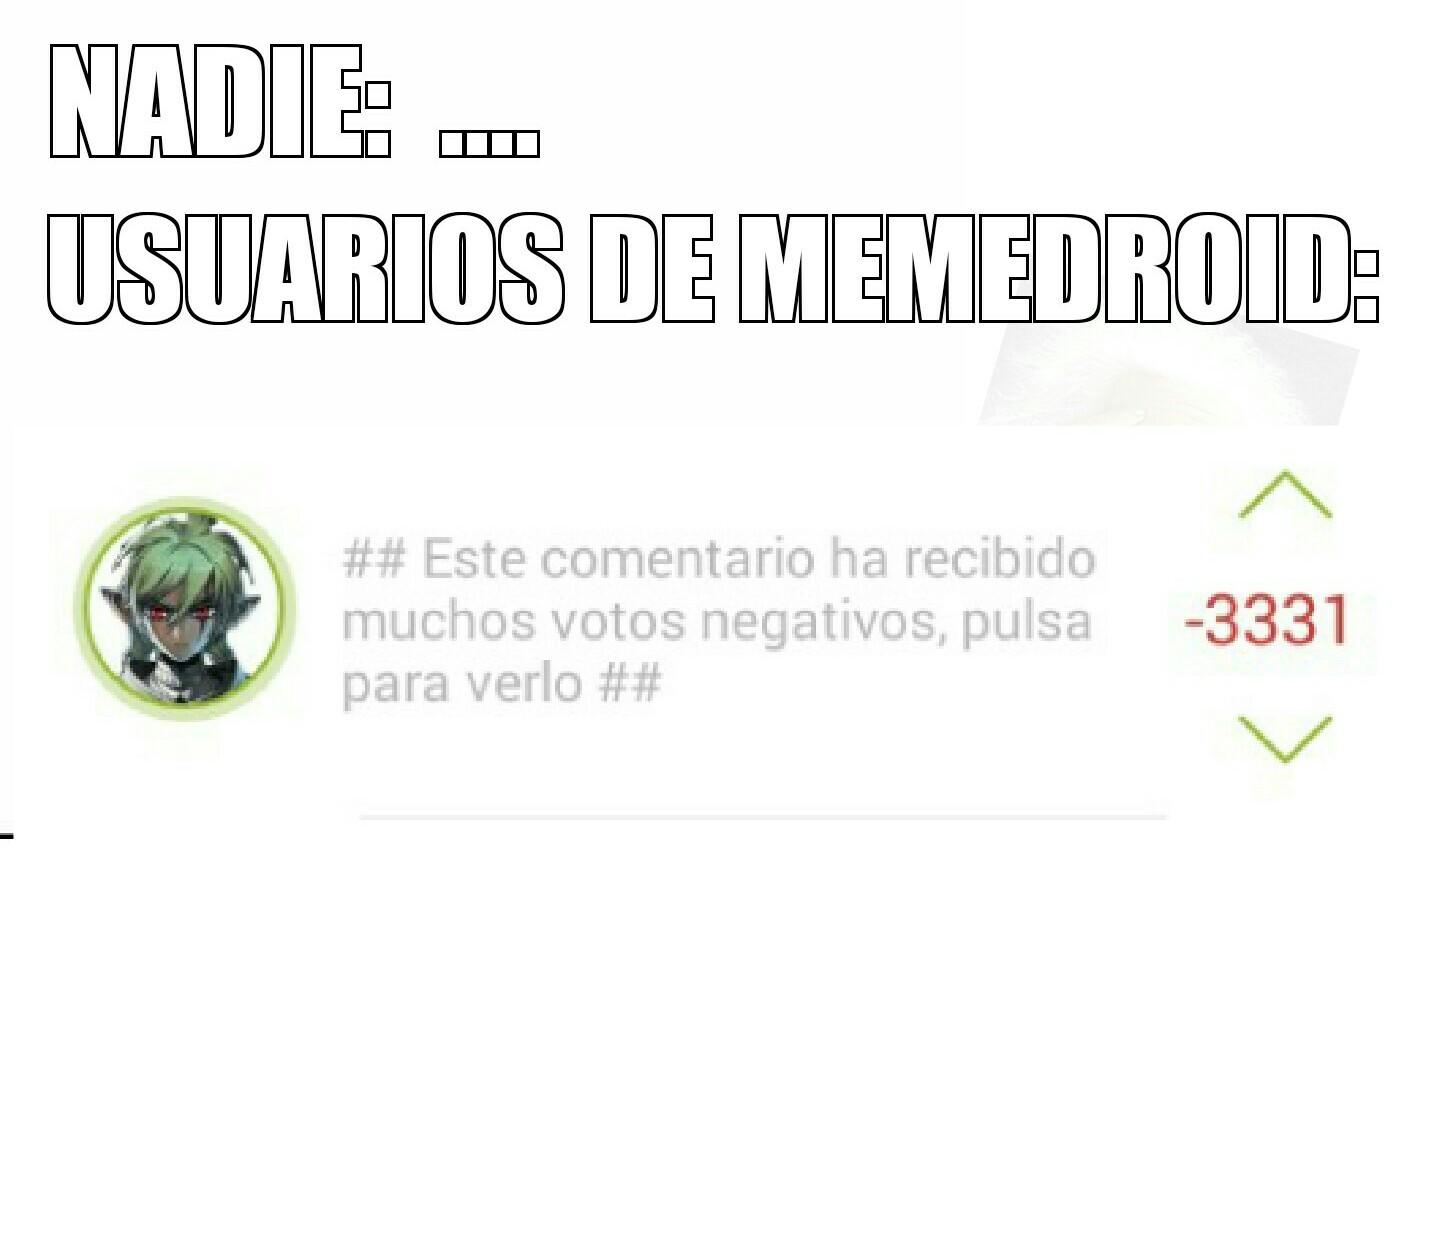 GG WP comunidad - meme